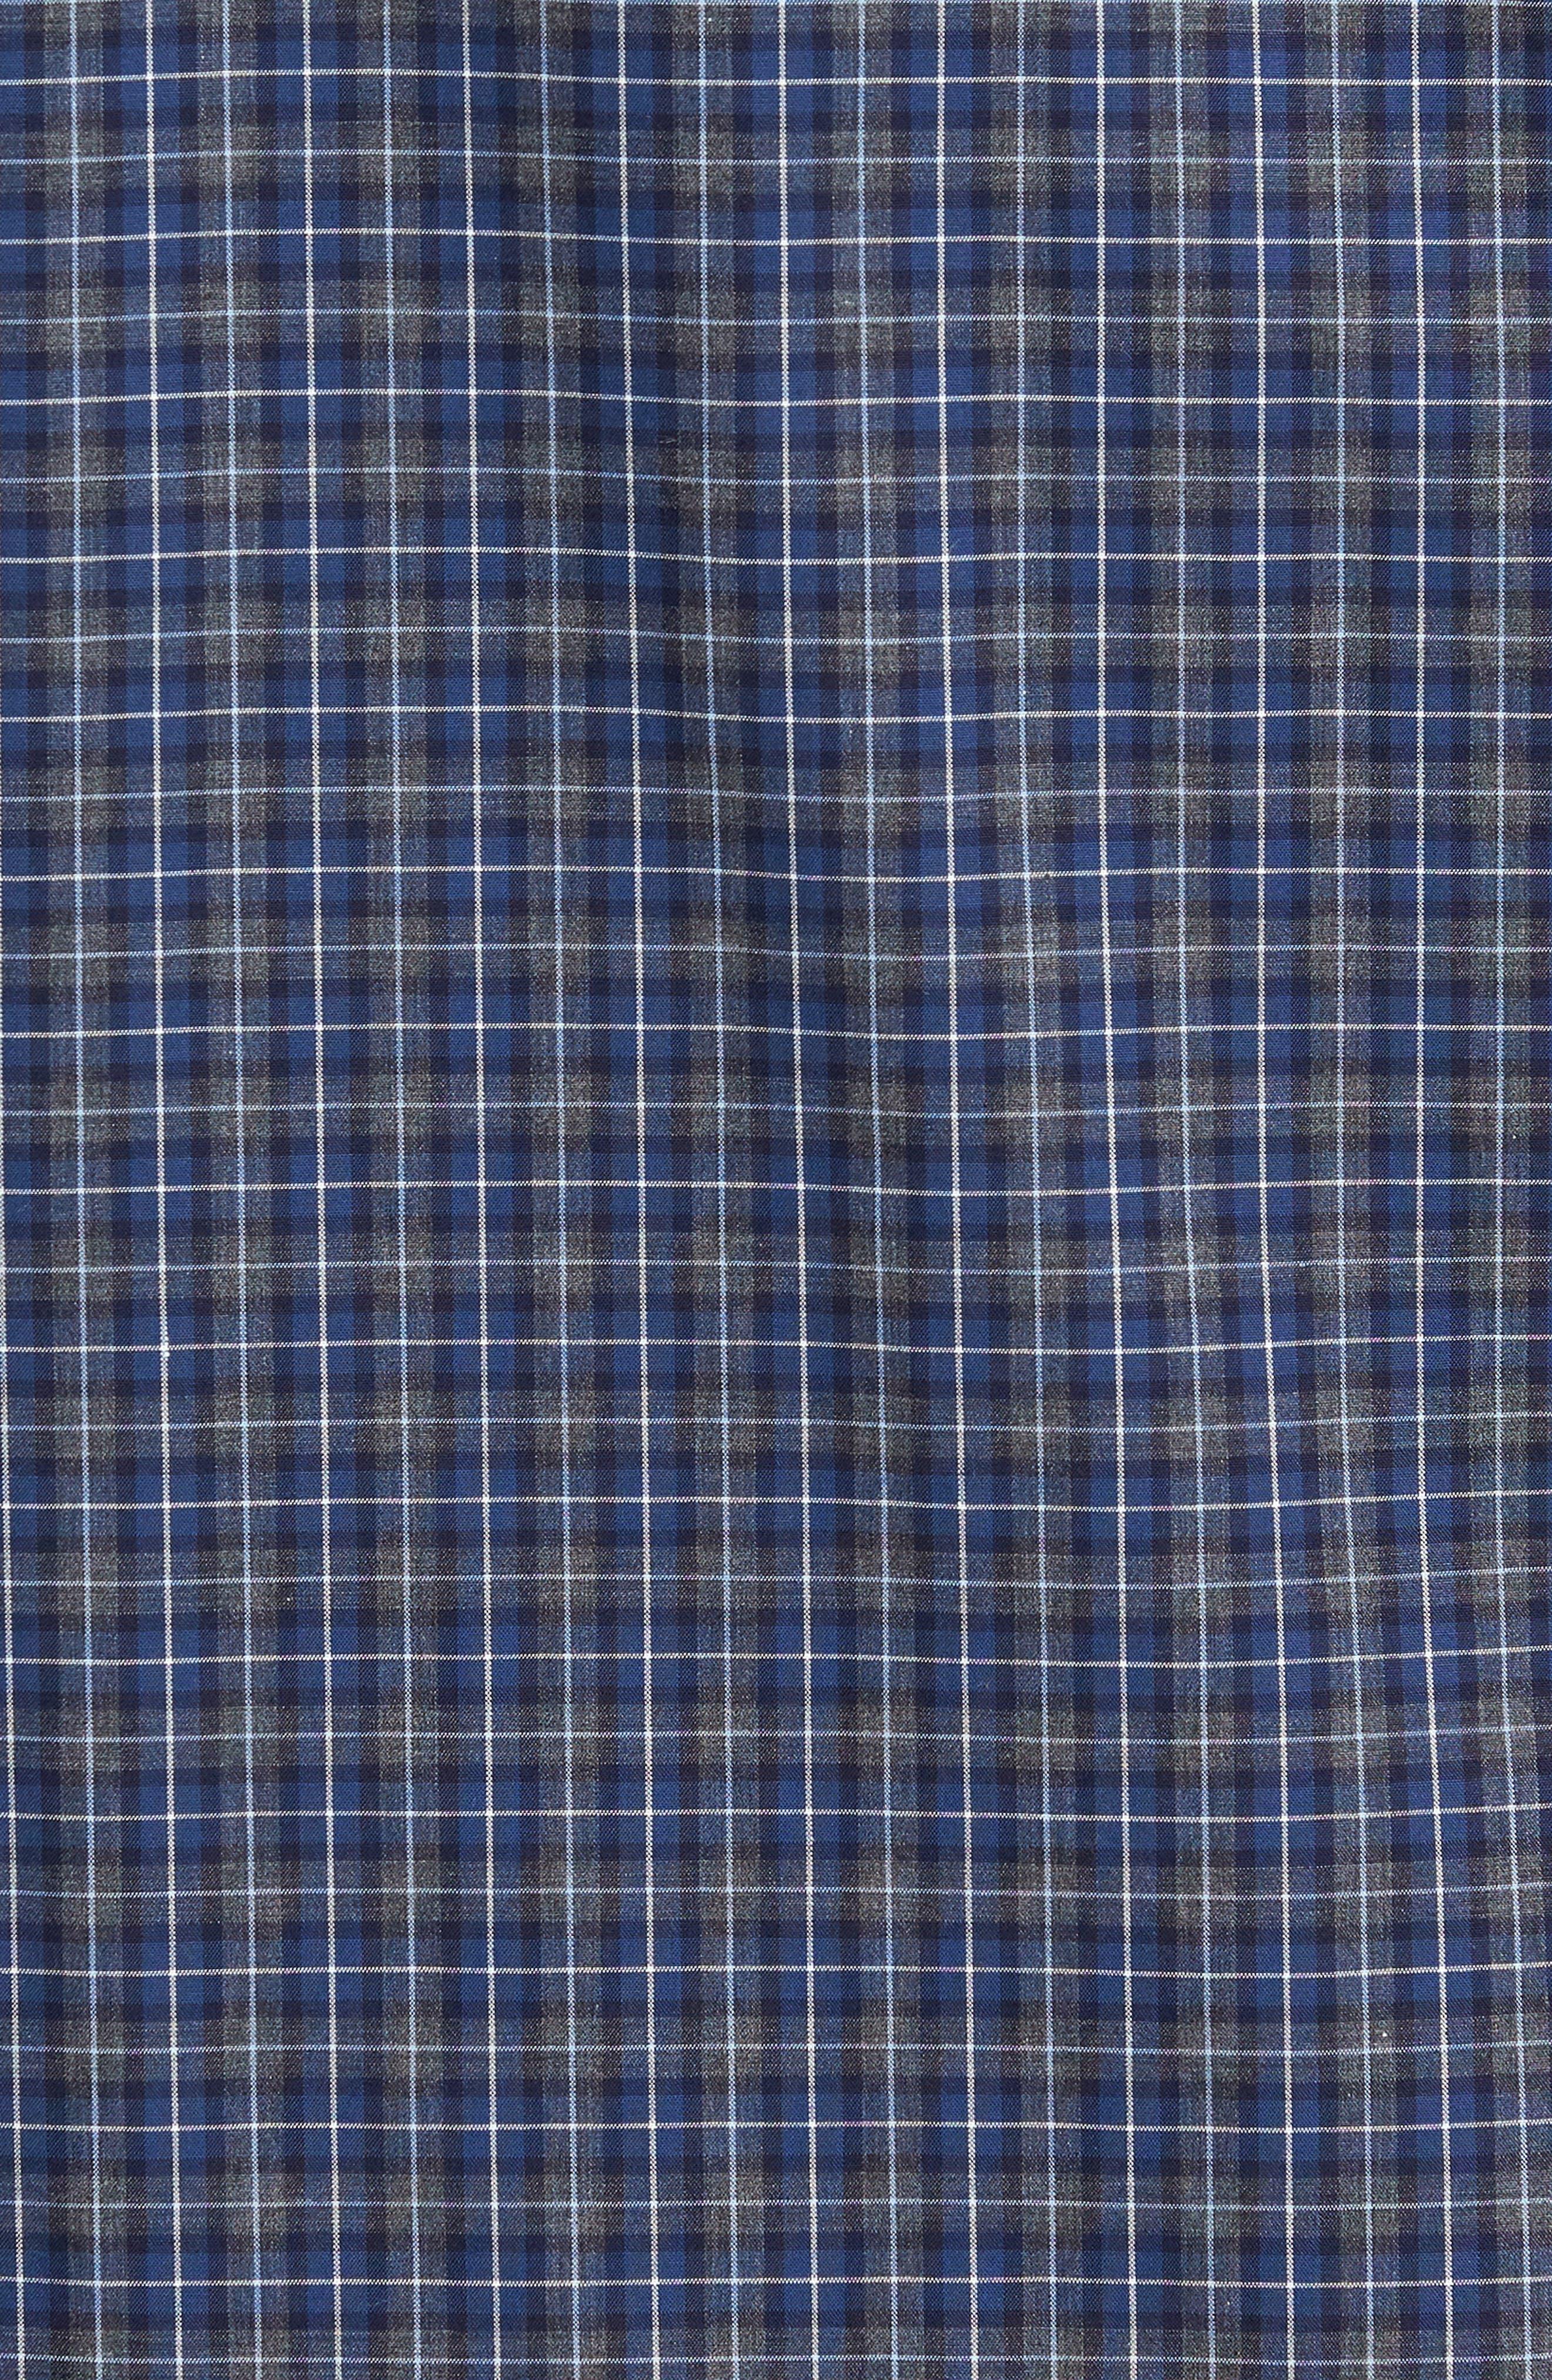 Trim Fit Check Sport Shirt,                             Alternate thumbnail 5, color,                             Navy Peacoat Grey Check